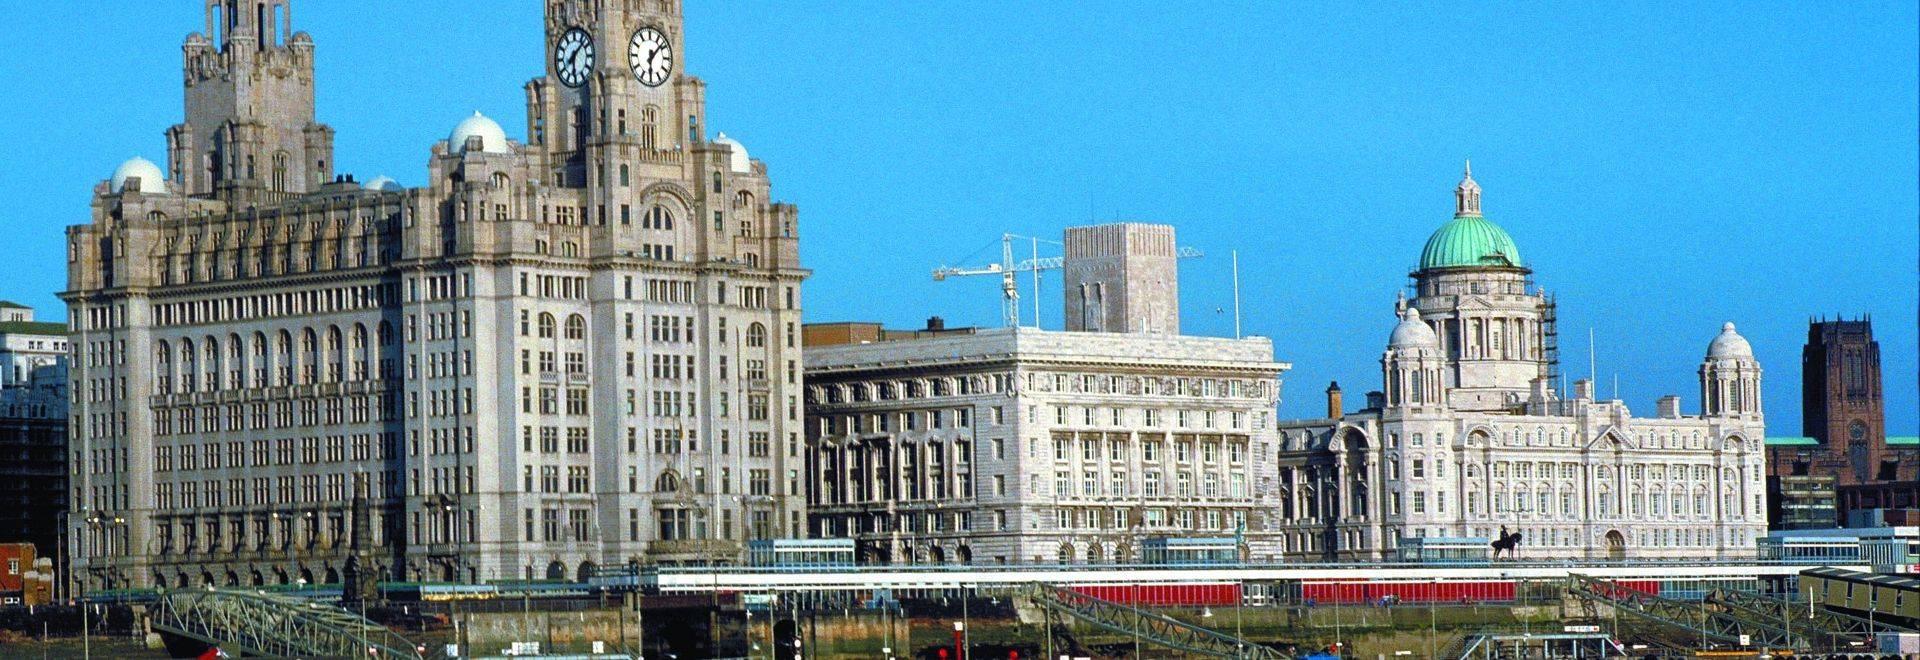 p16S5_Daresbury_Liverpool.jpg